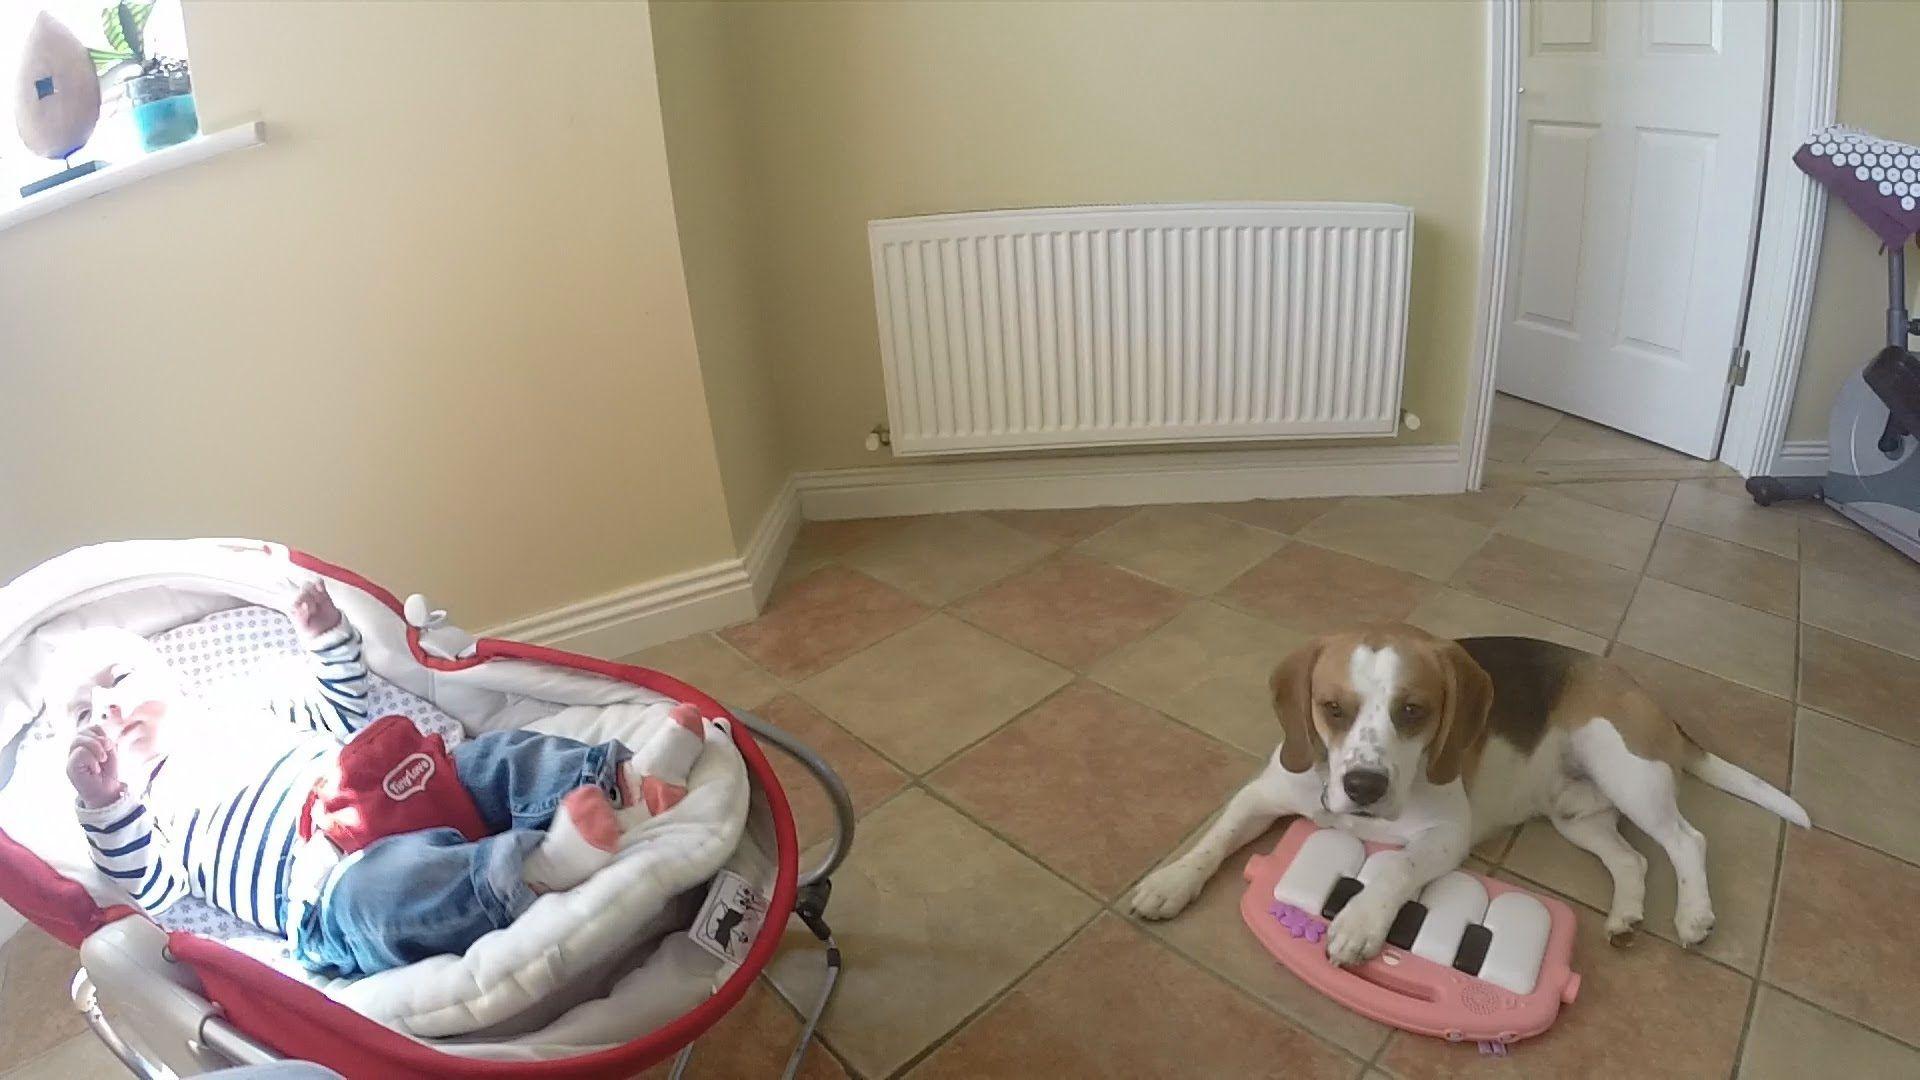 Download Smart Beagle Adorable Dog - ca672caf6f0dae20bb3c1915491dd0bb  2018_422758  .jpg